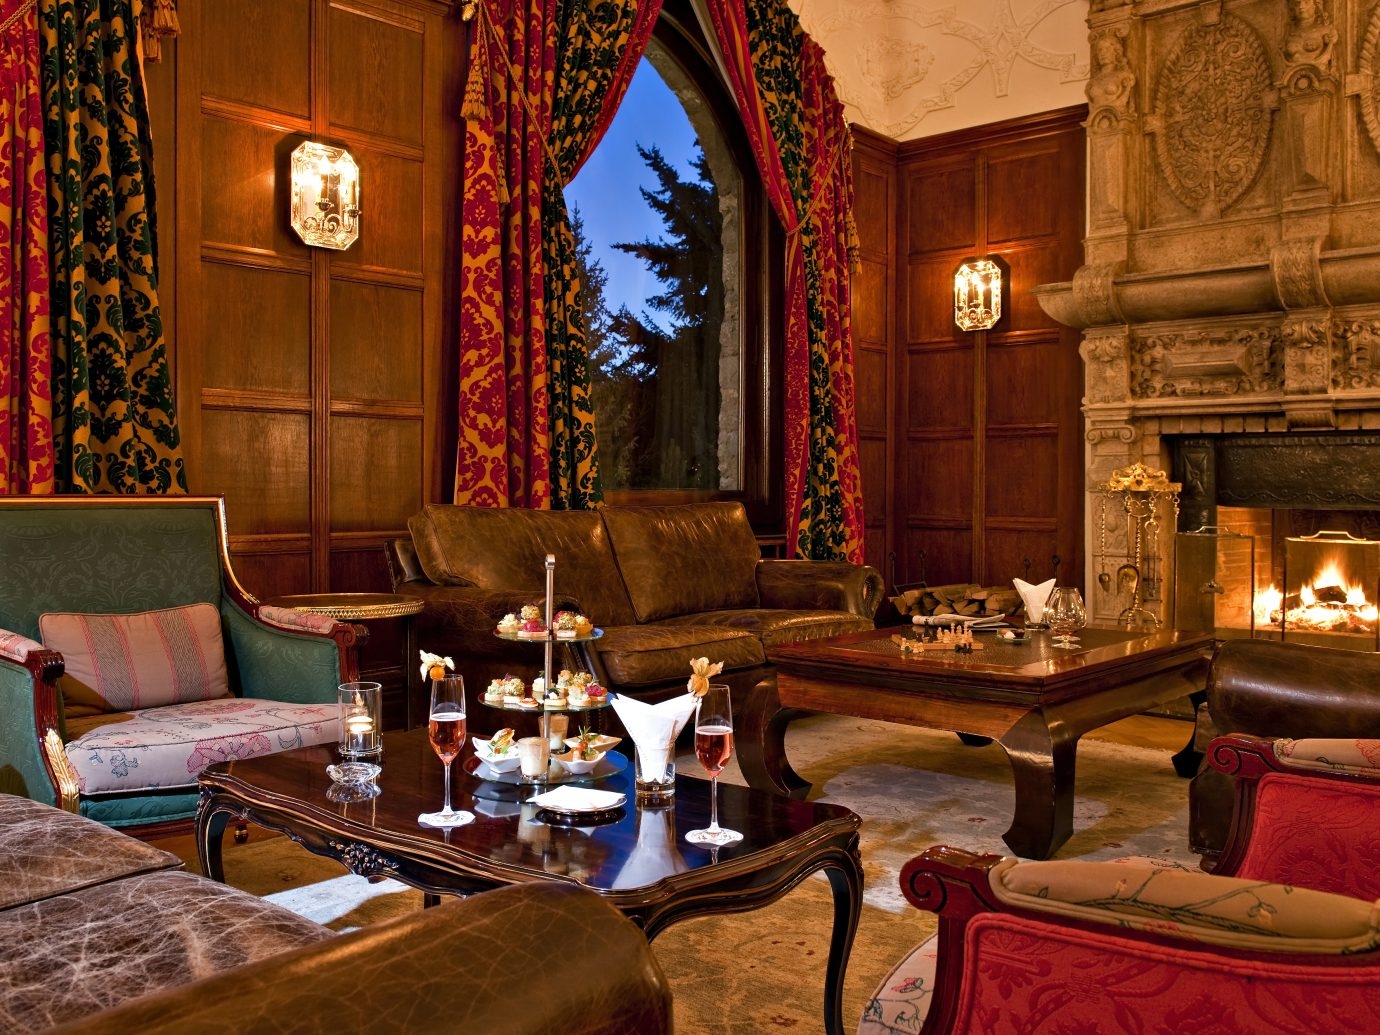 Lounge in Carlton Hotel in St. Moritz